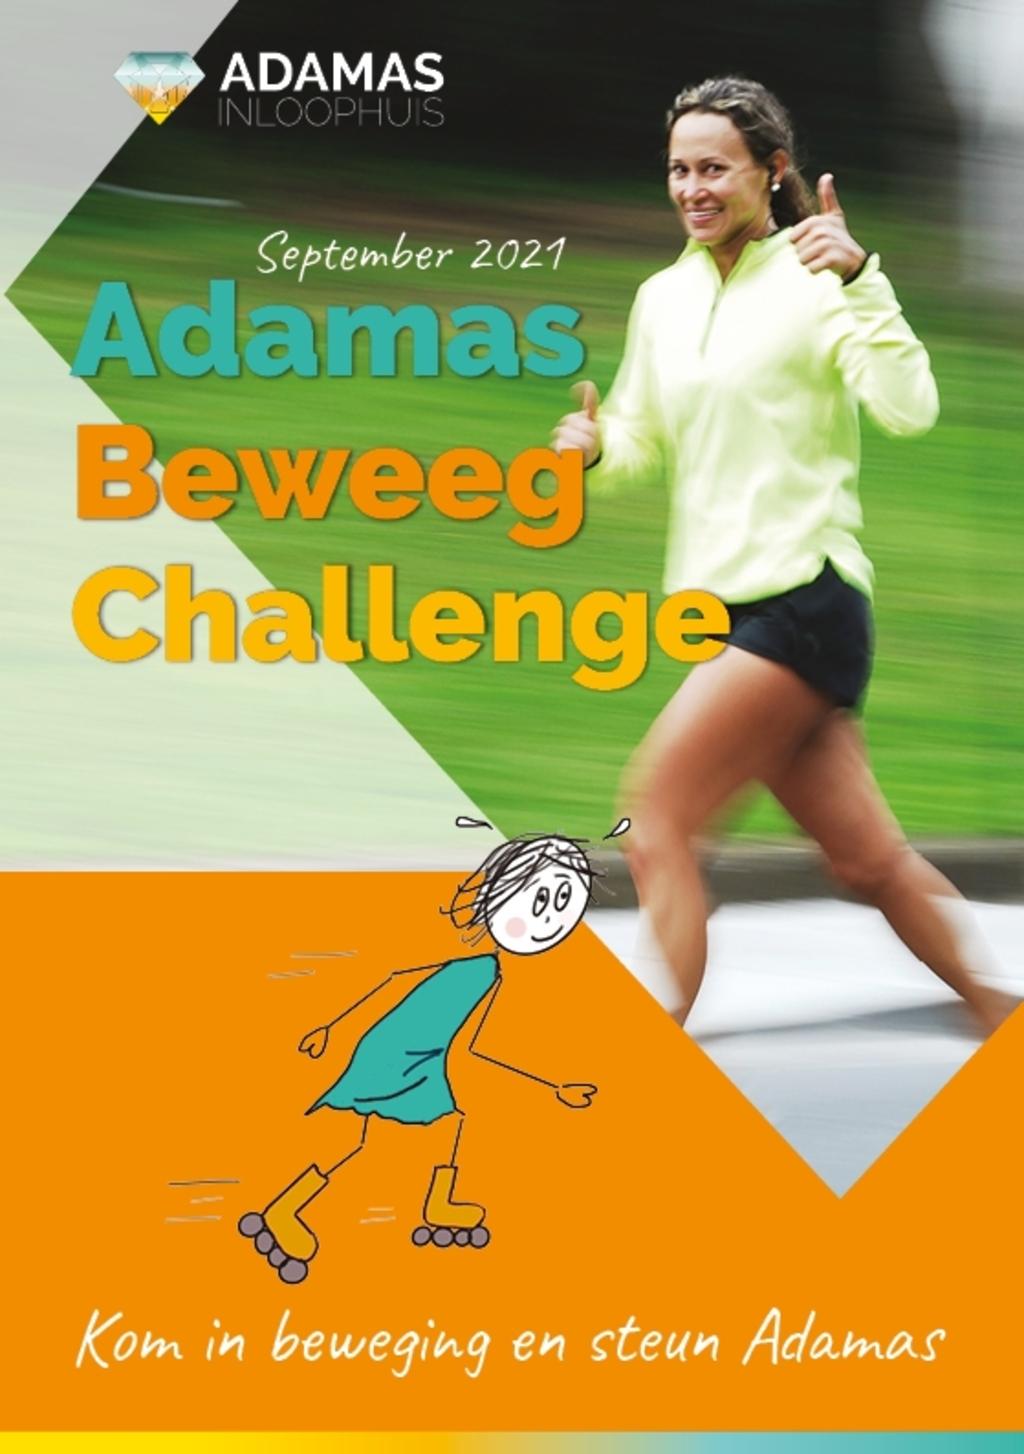 Adamas Beweeg Challenge Annelies Osinga © BDU media